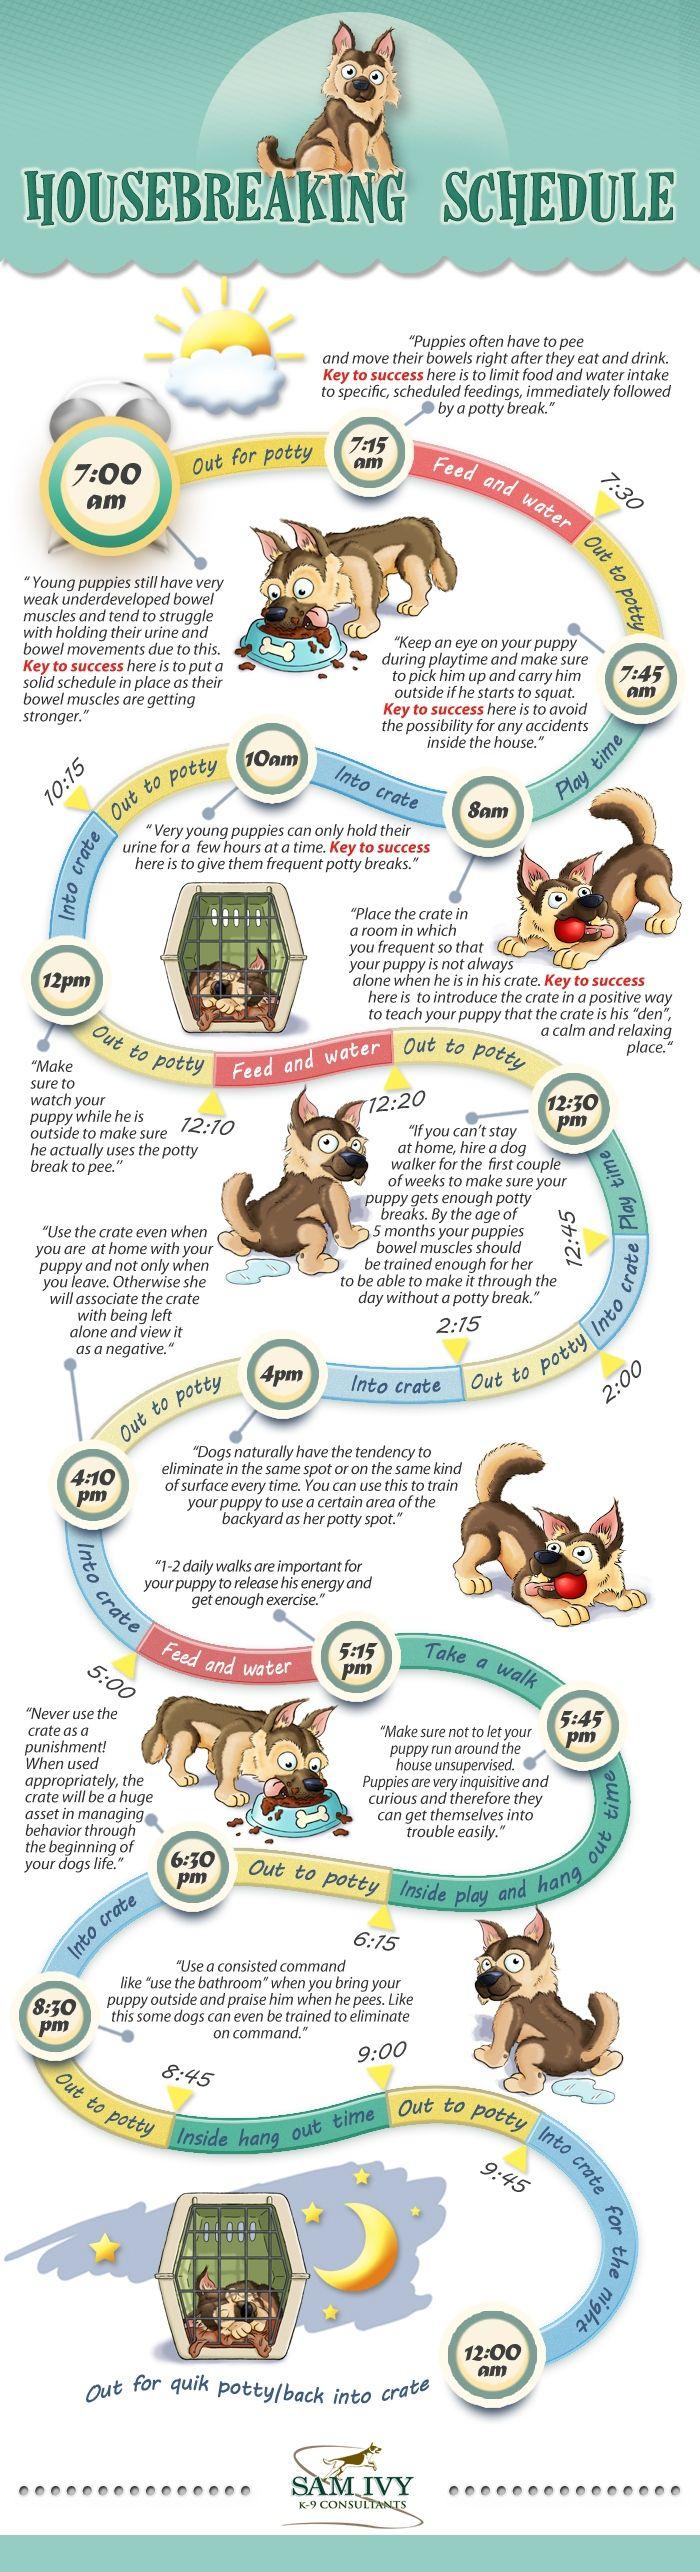 Sam Ivy K9 S Housebreaking Schedule Training Your Puppy Puppies Puppy Training Tips